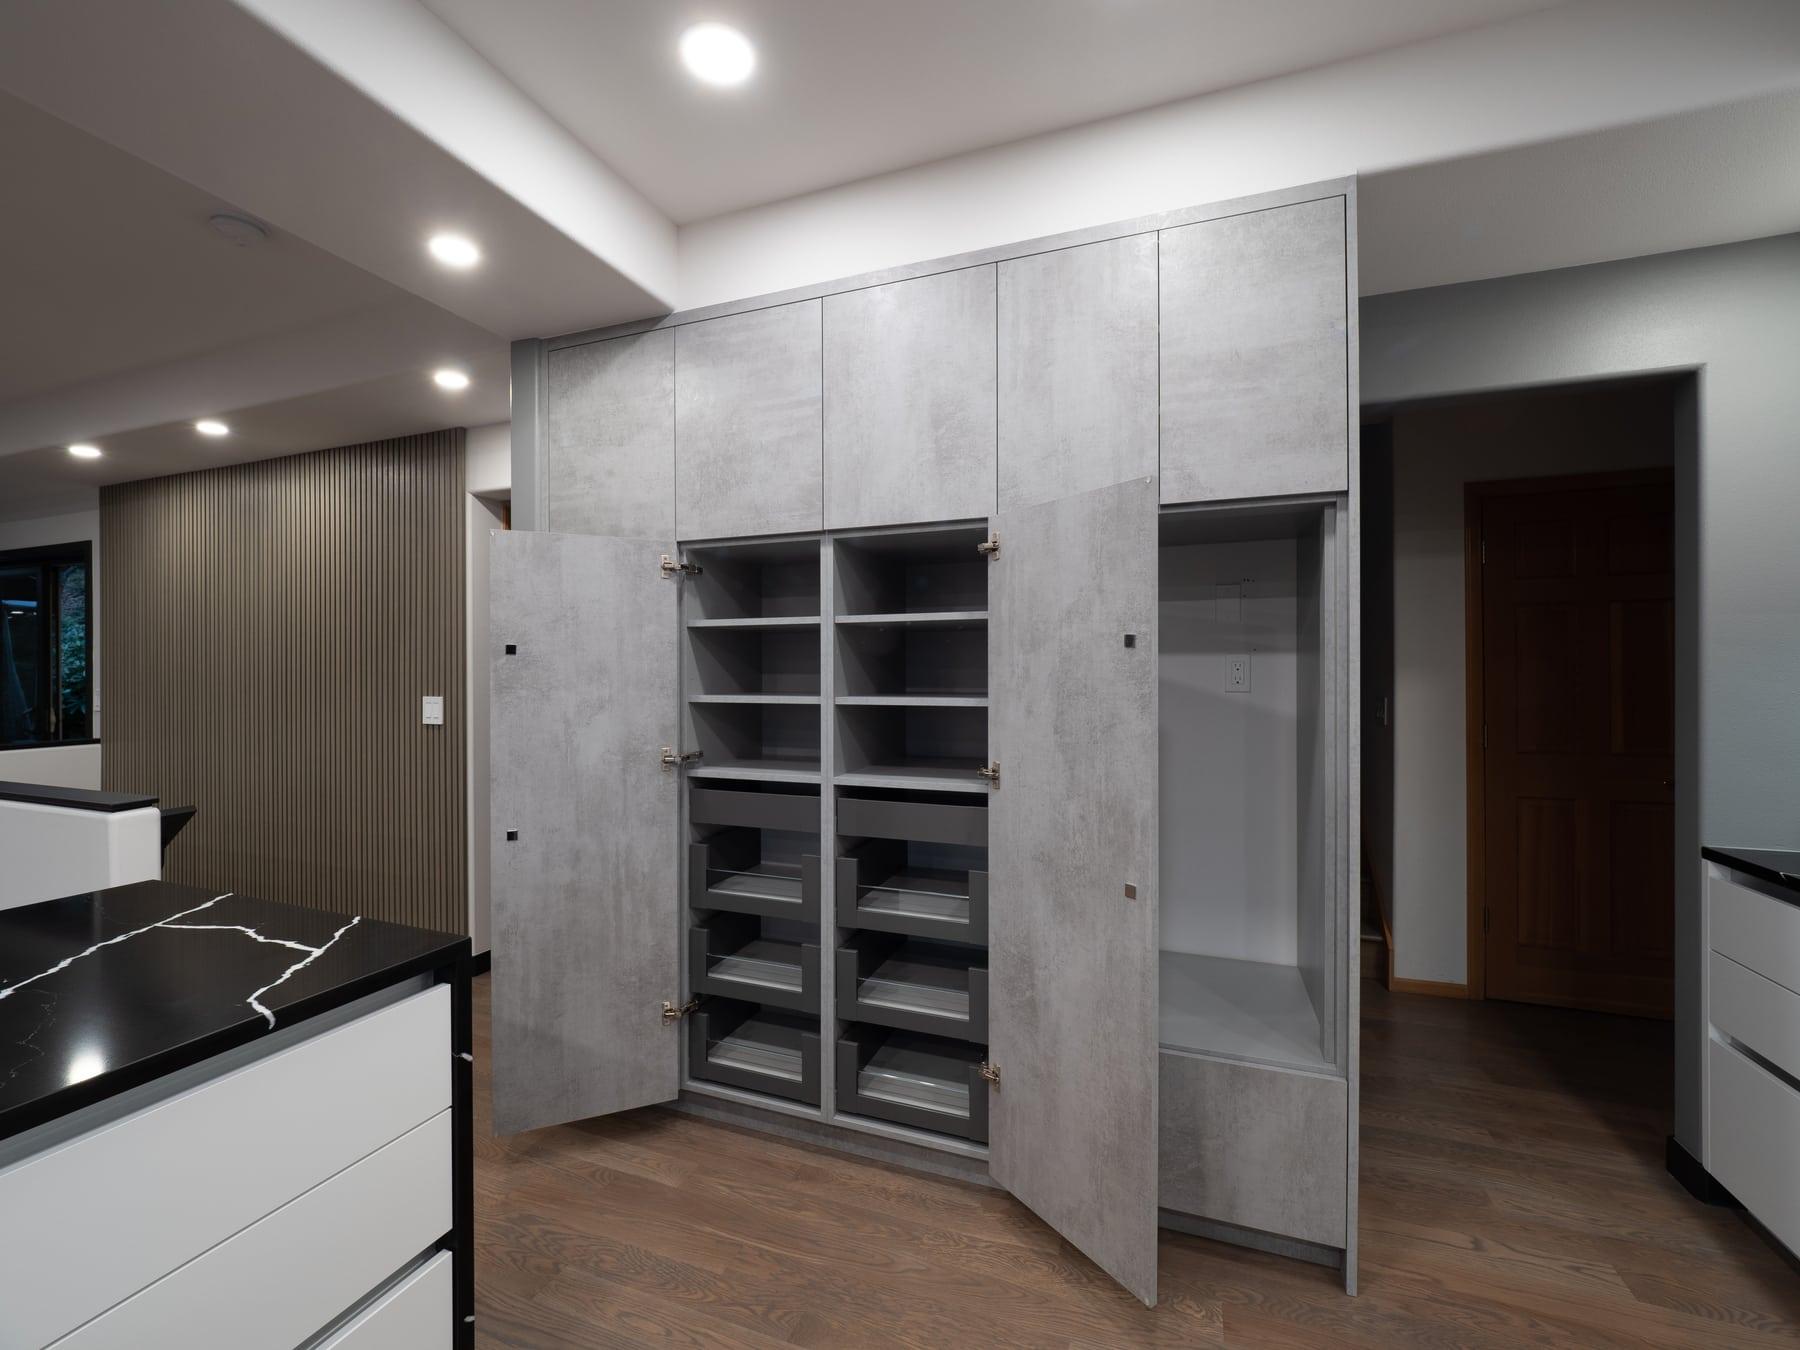 Bellevue kitchen and living room remodel